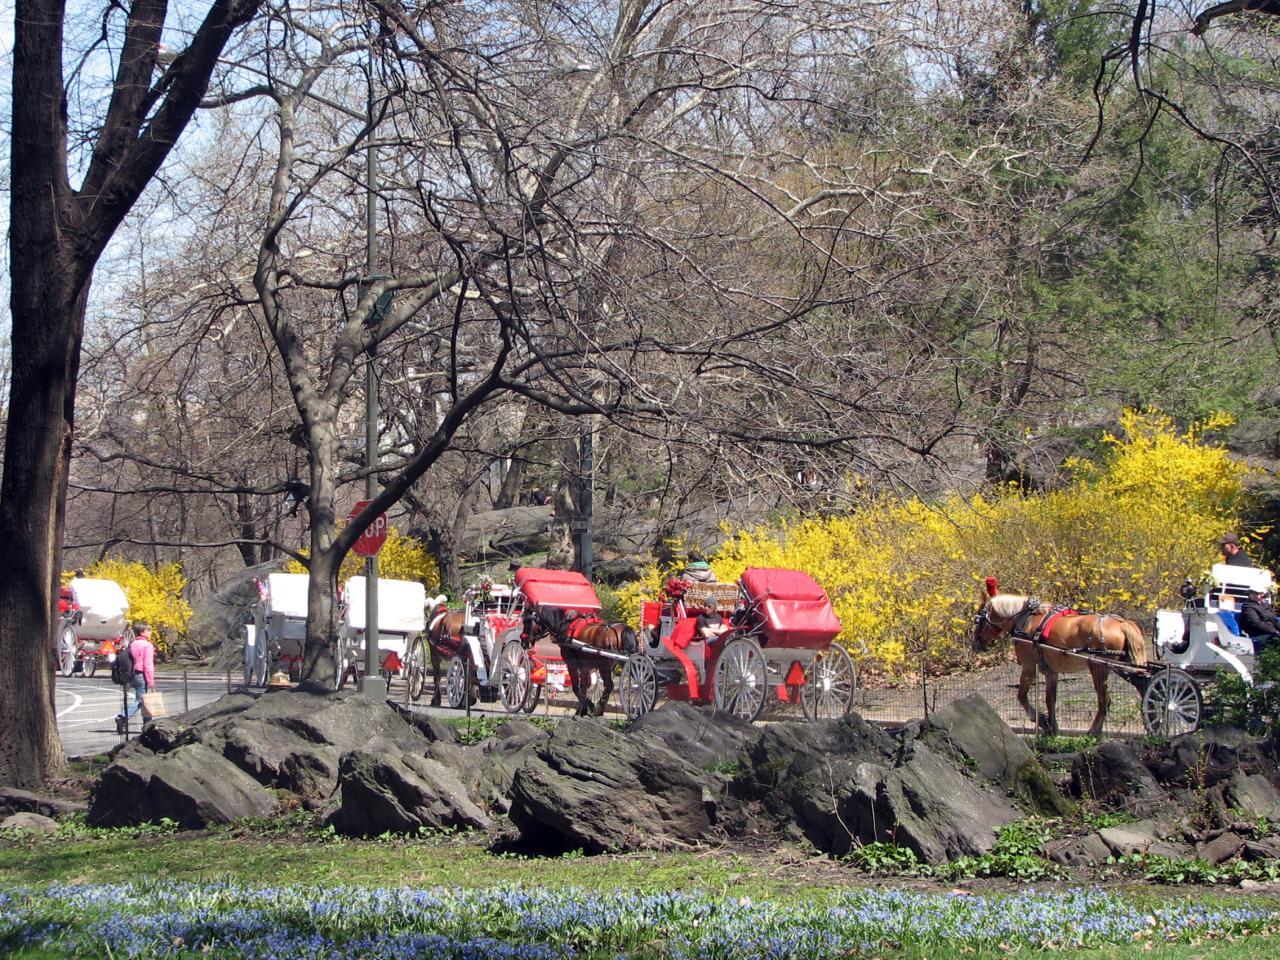 04.16.09 Central Park (18)